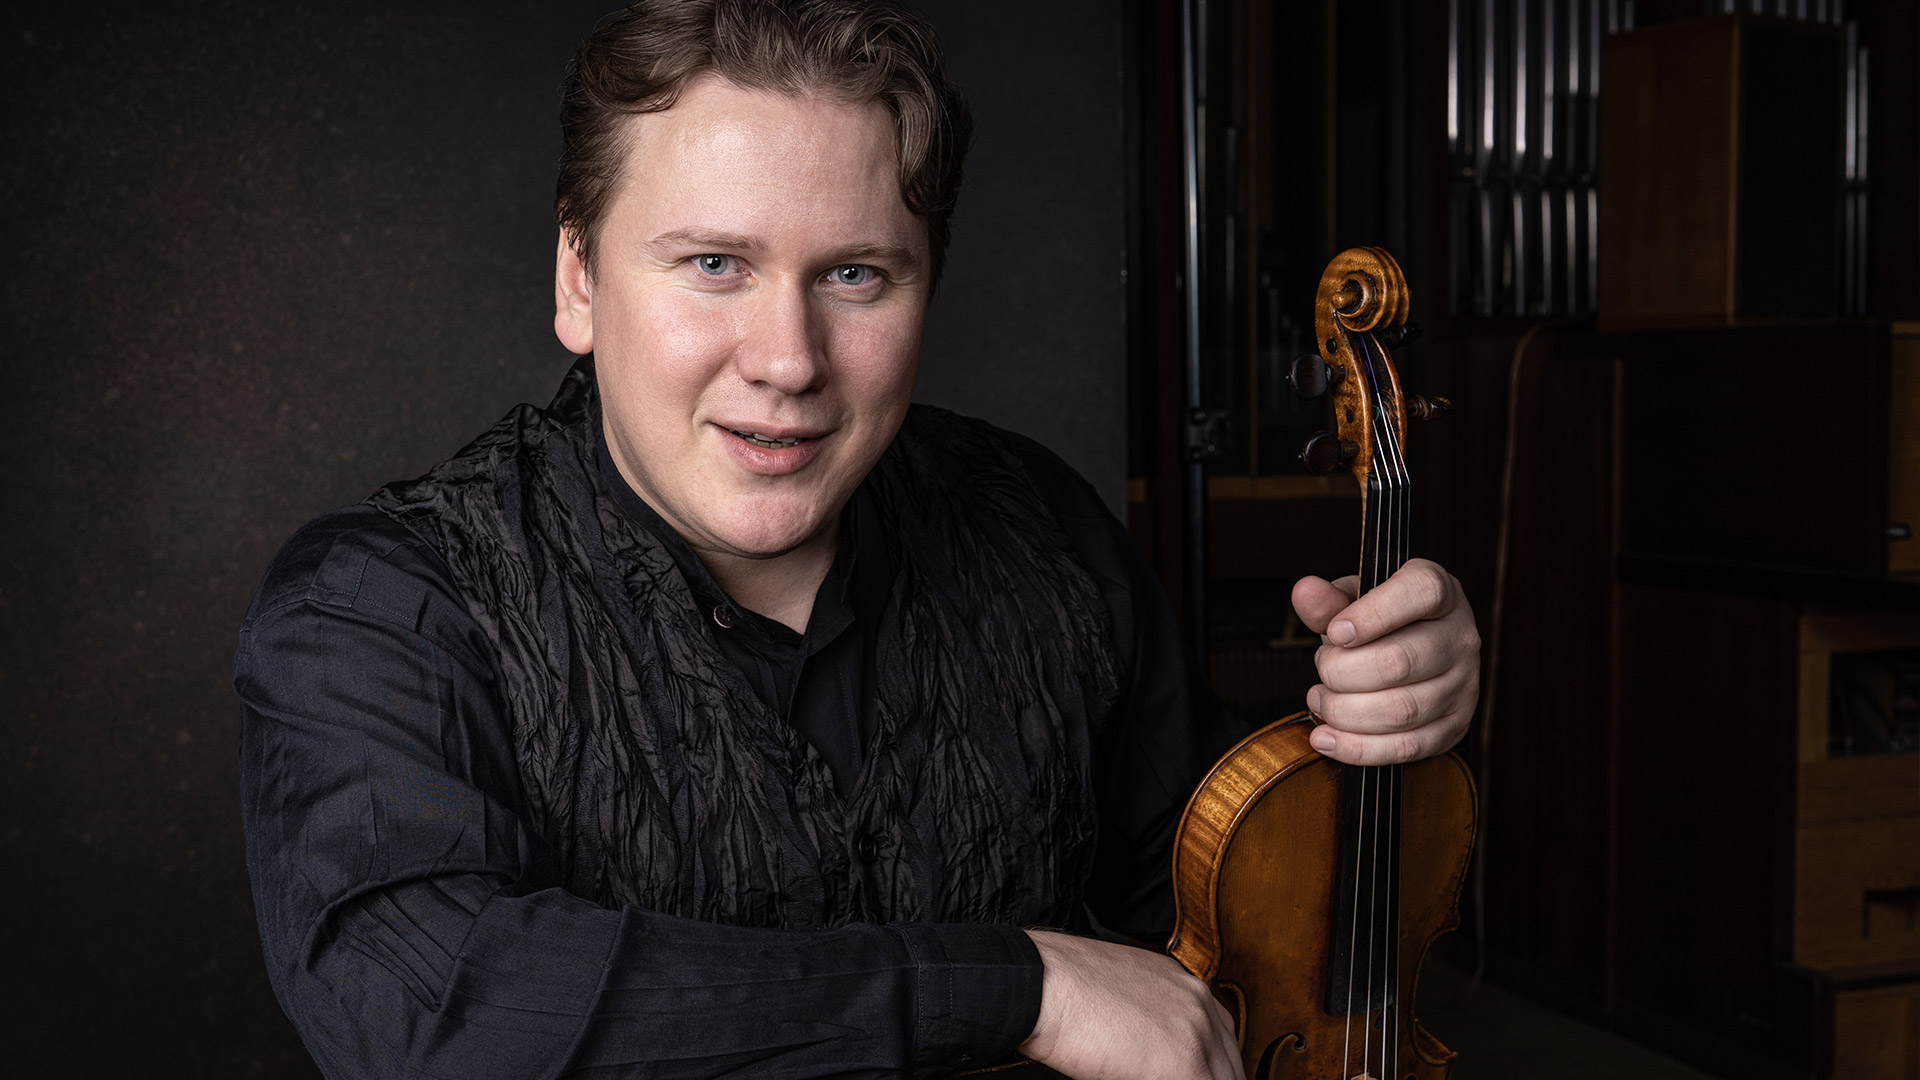 Mozart - Sonata KV379, Andrej Bielow - violin